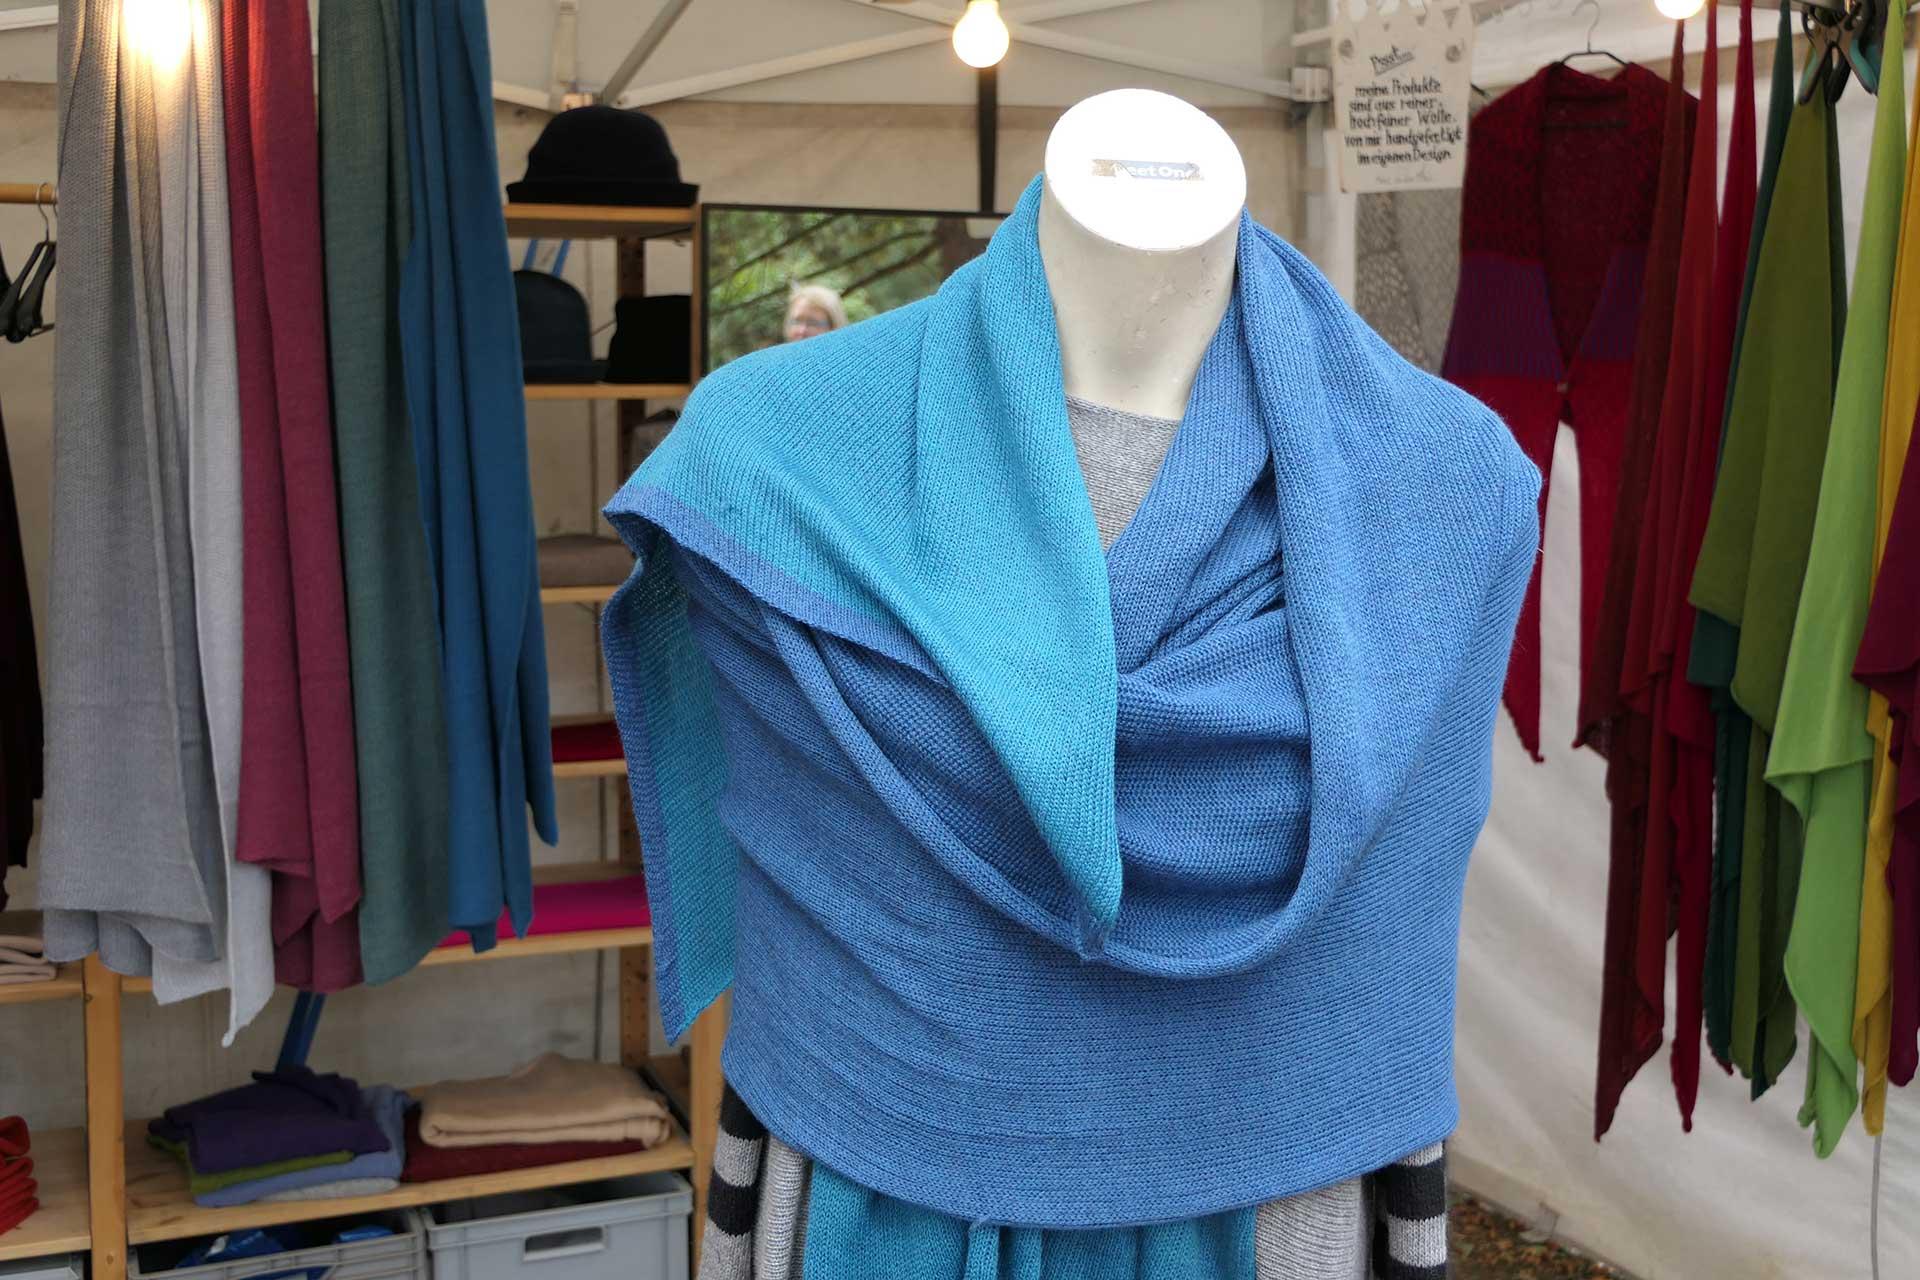 Mode Shop Kunsthandwer